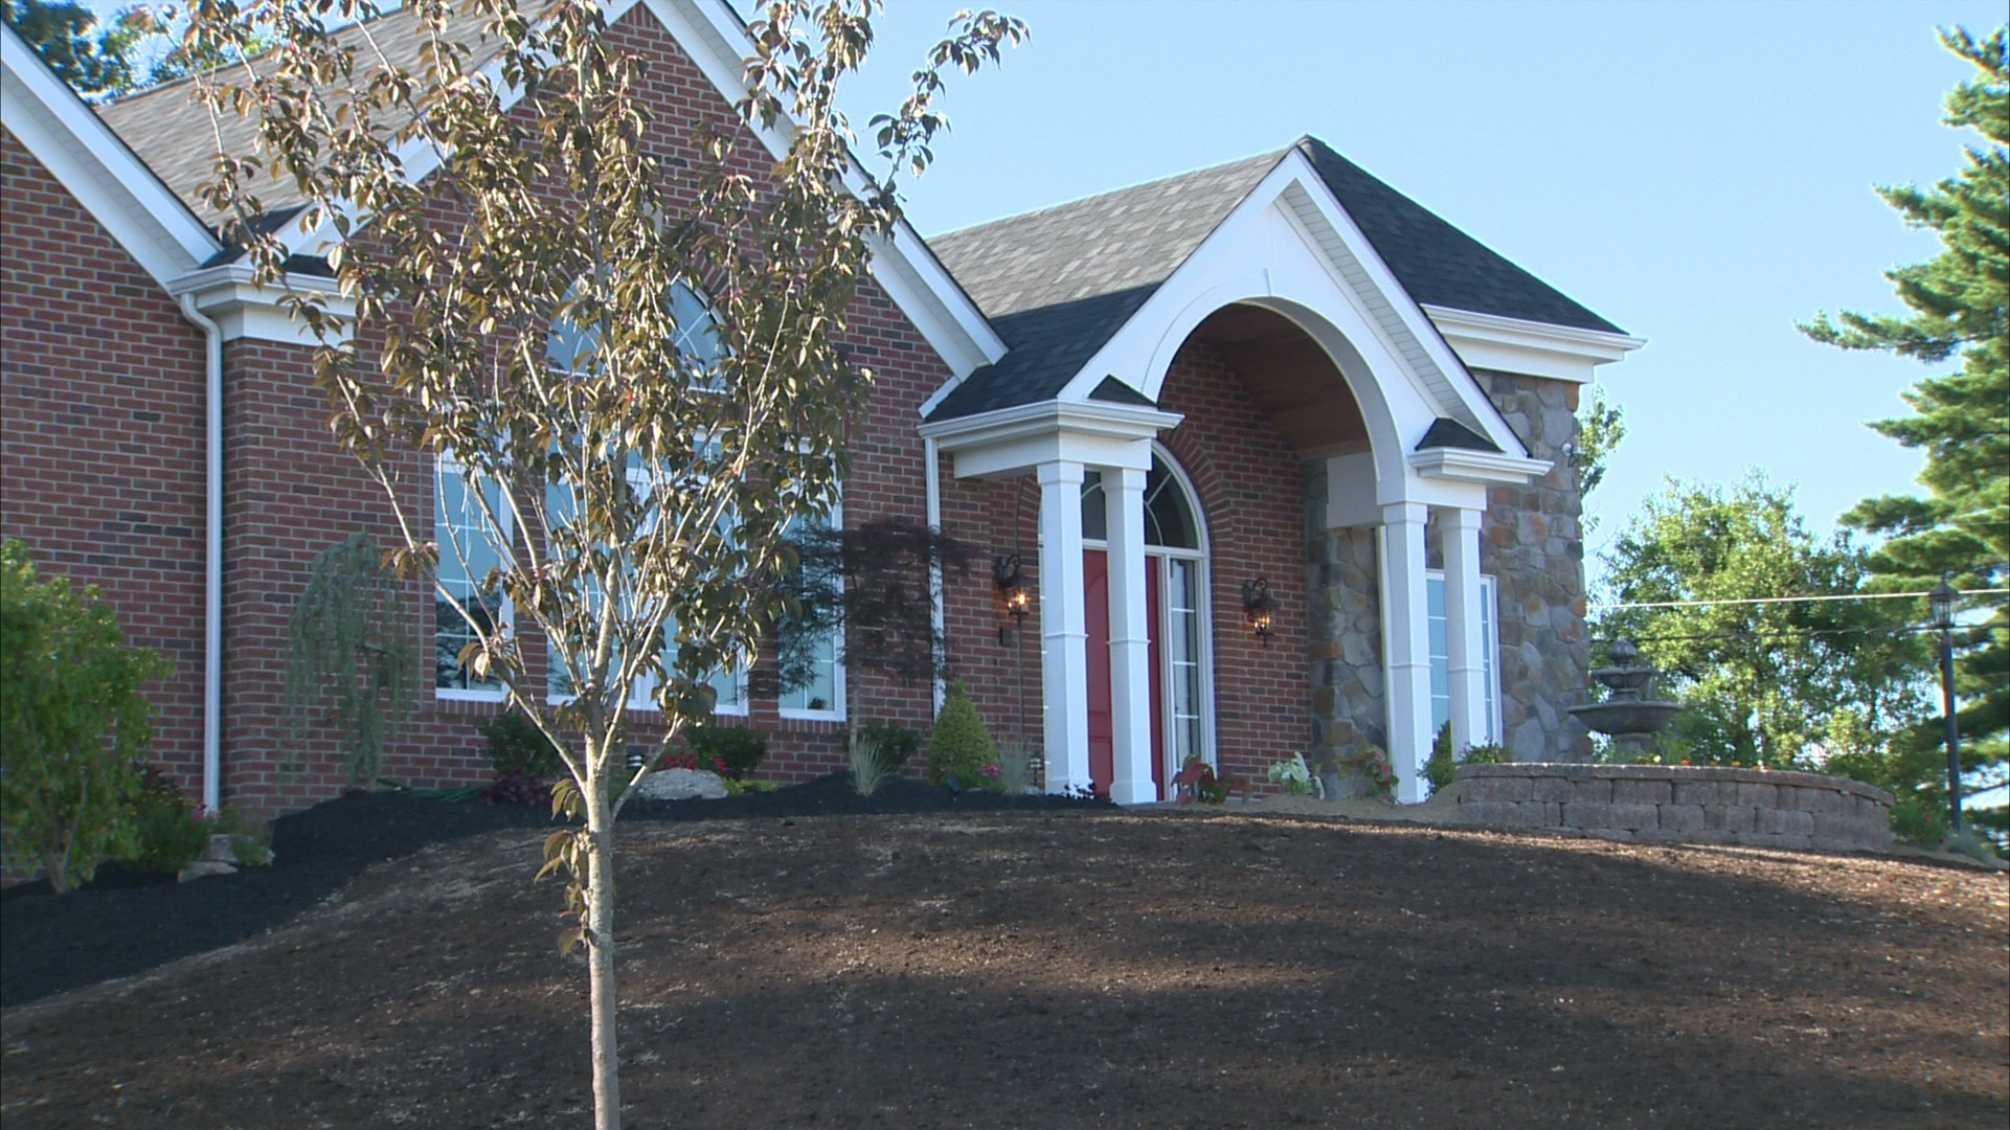 Doug Vitale's home